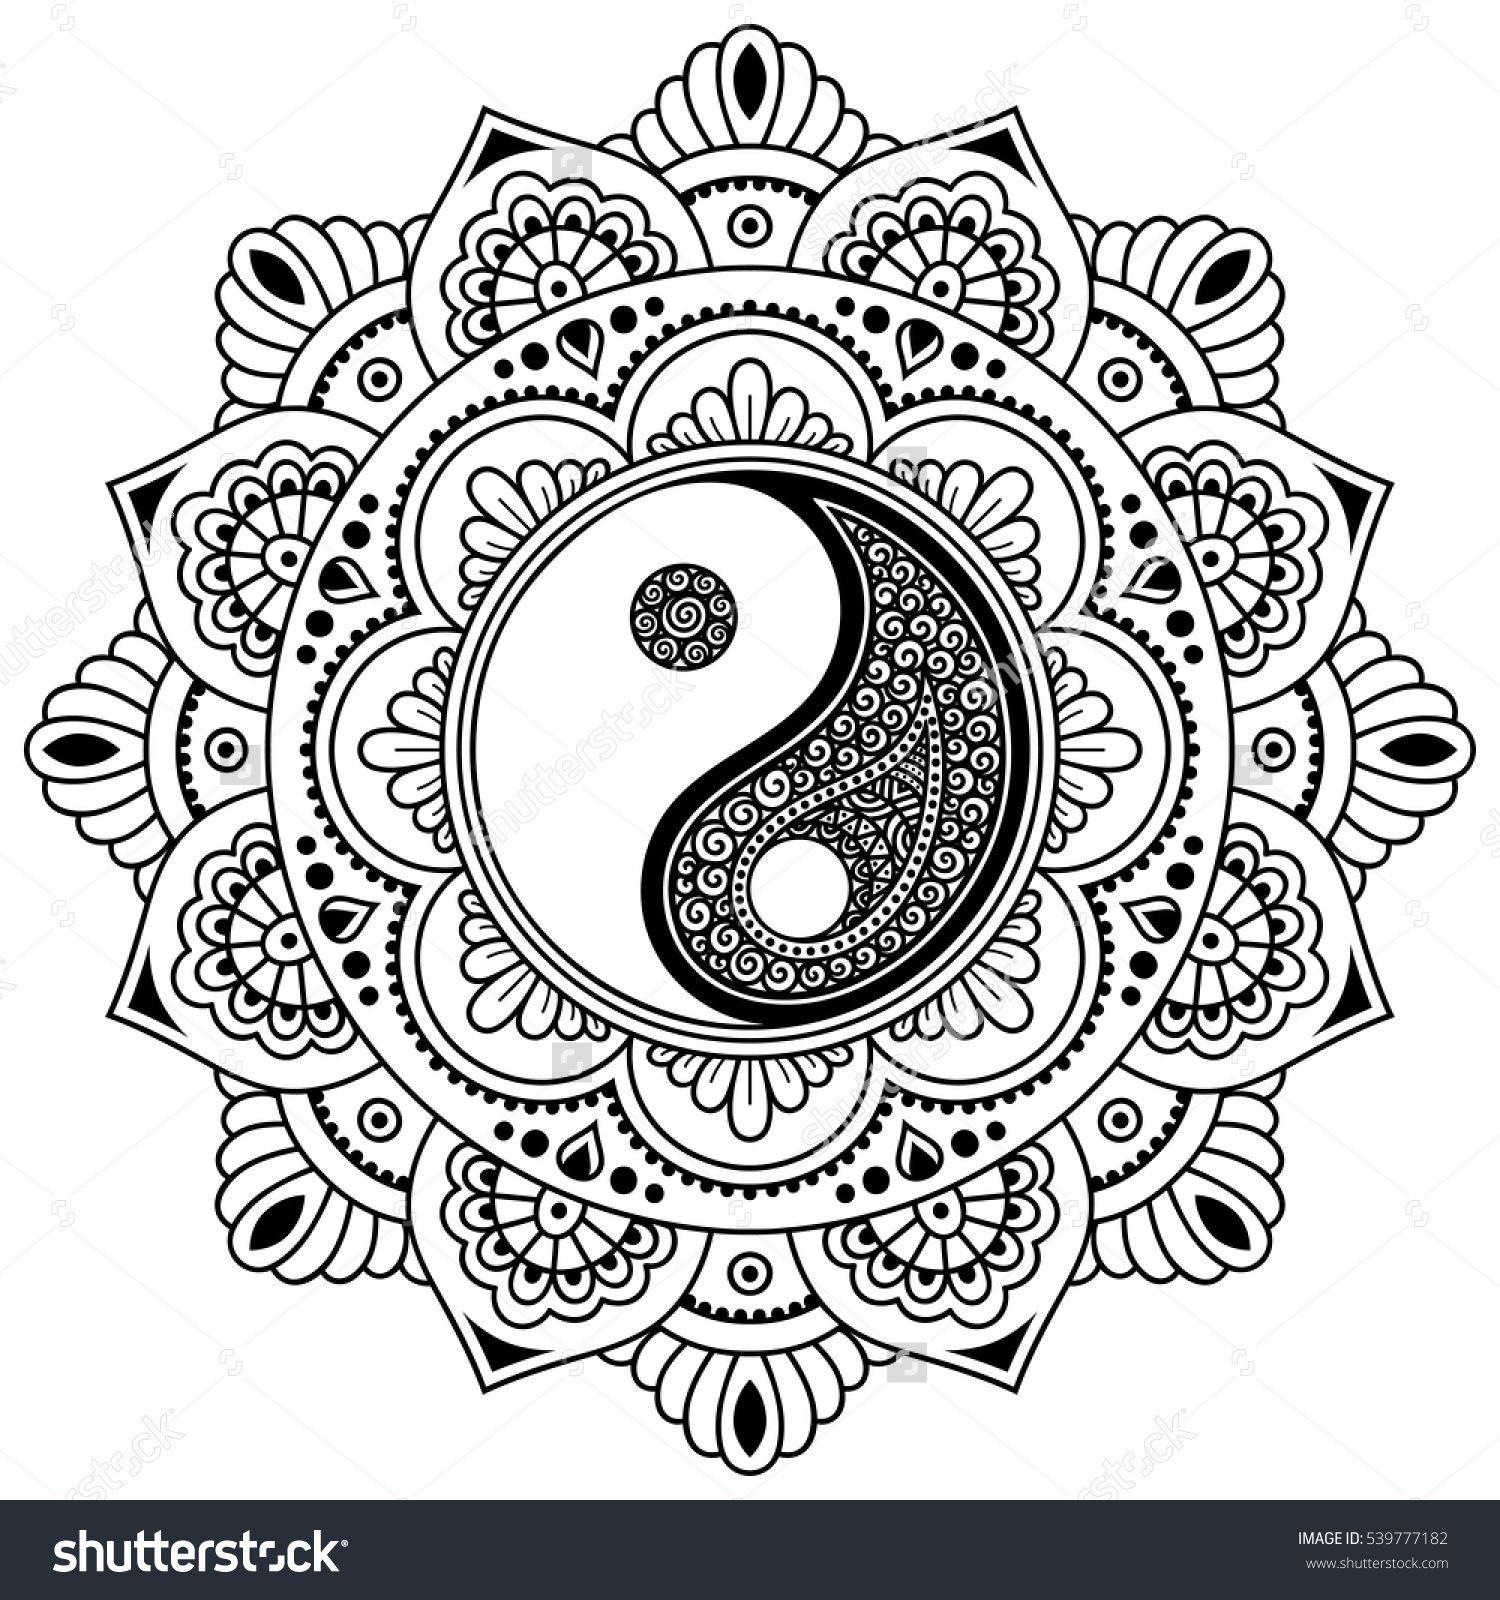 Vector henna tatoo mandalaYin yang decorative symbol Mehndi